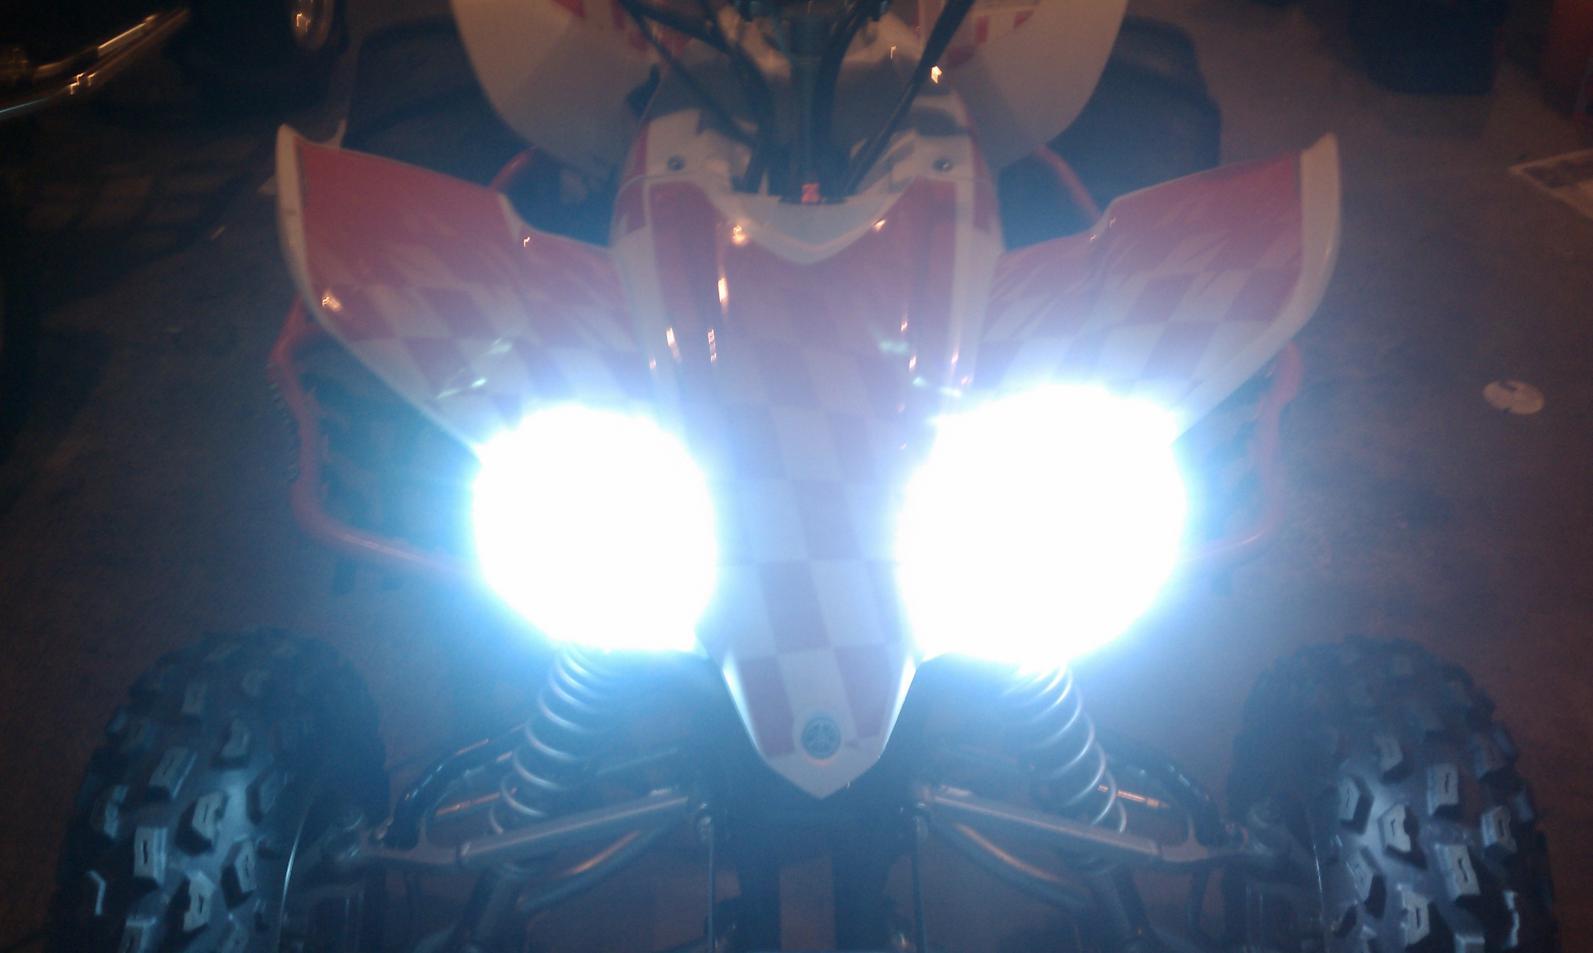 55 Watt HIDs with Ricky Stator - Yamaha YFZ450 Forum